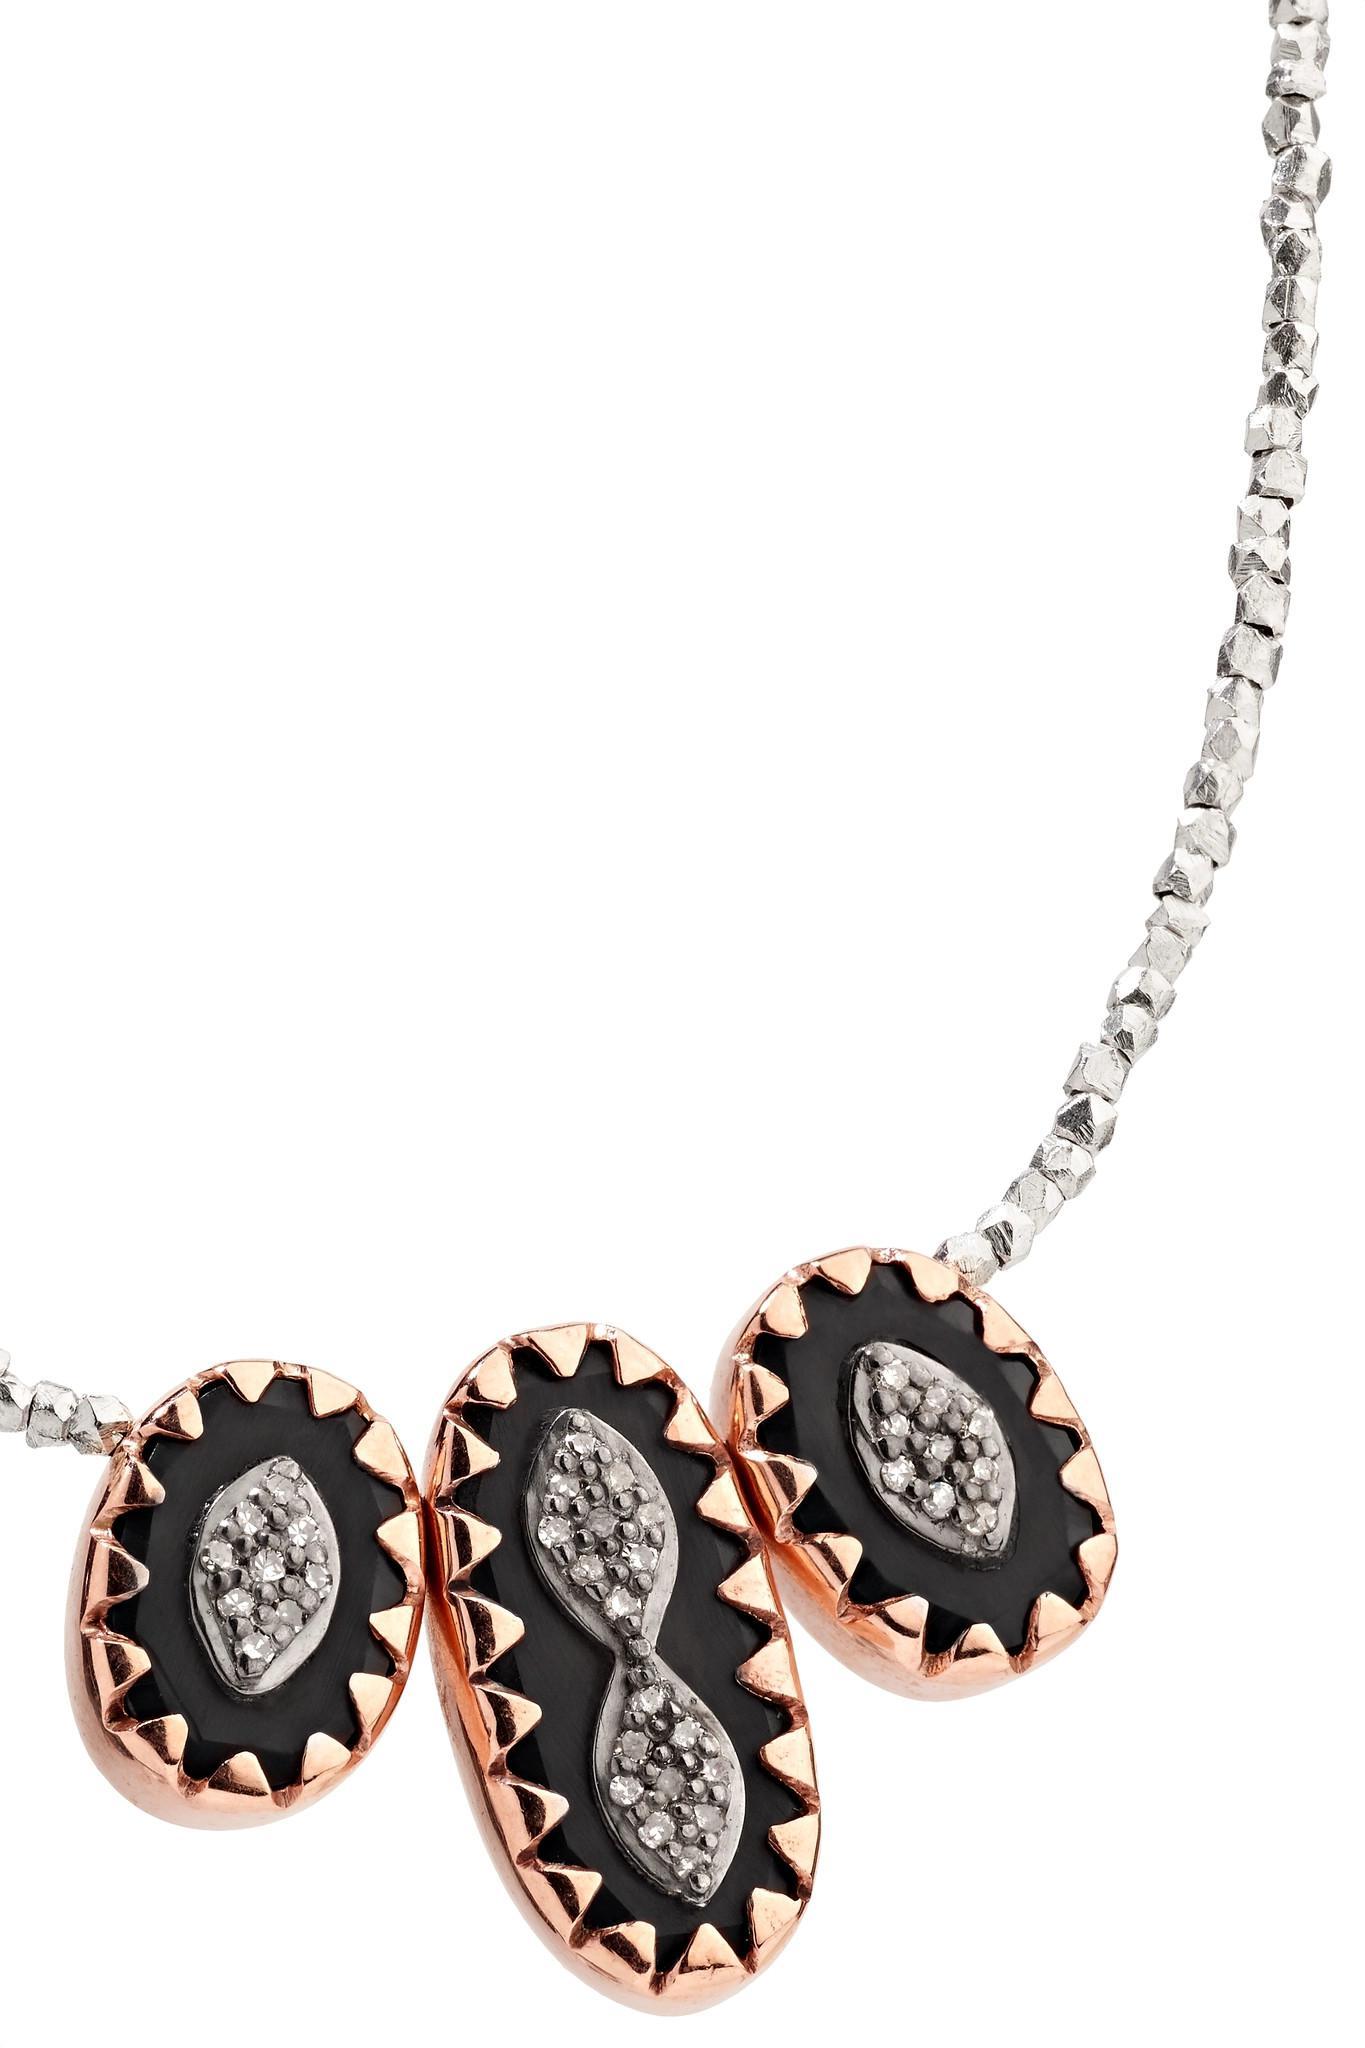 Pascale Monvoisin Montauk 9-karat Rose Gold, Sterling Silver, Bakelite And Diamond Necklace in Metallic